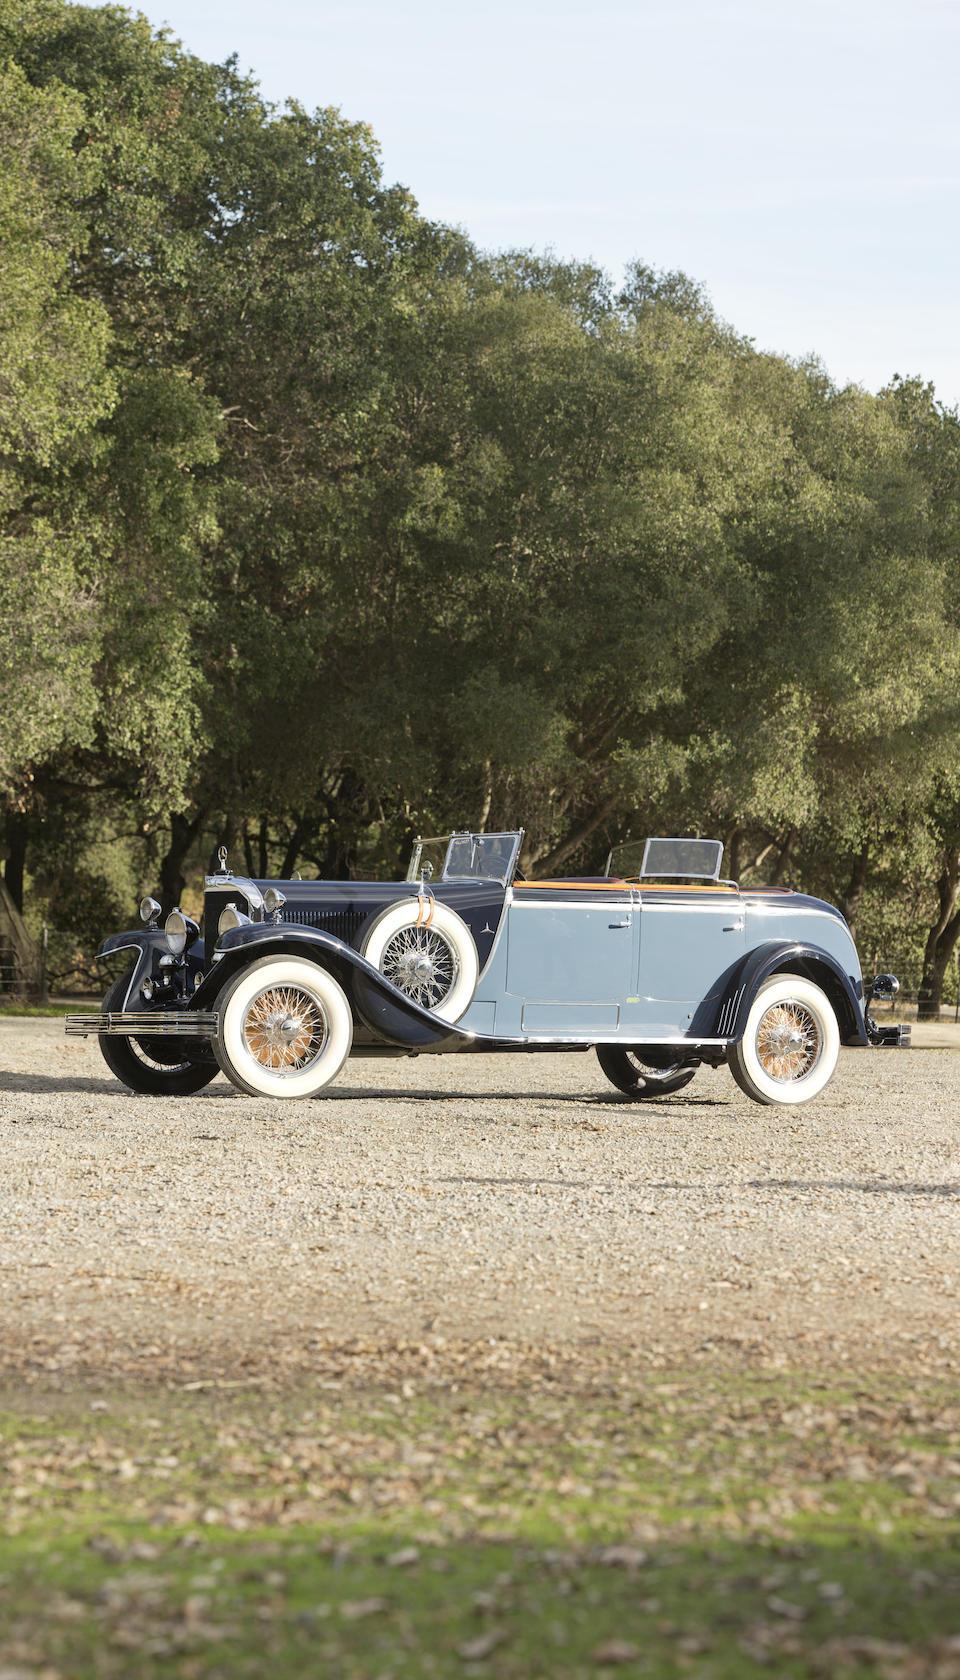 <b>1928 Mercedes-Benz 630 K 'La Baule' Torpedo Transformable  </b><br />Chassis no. 385133 <br />Engine no. 60793